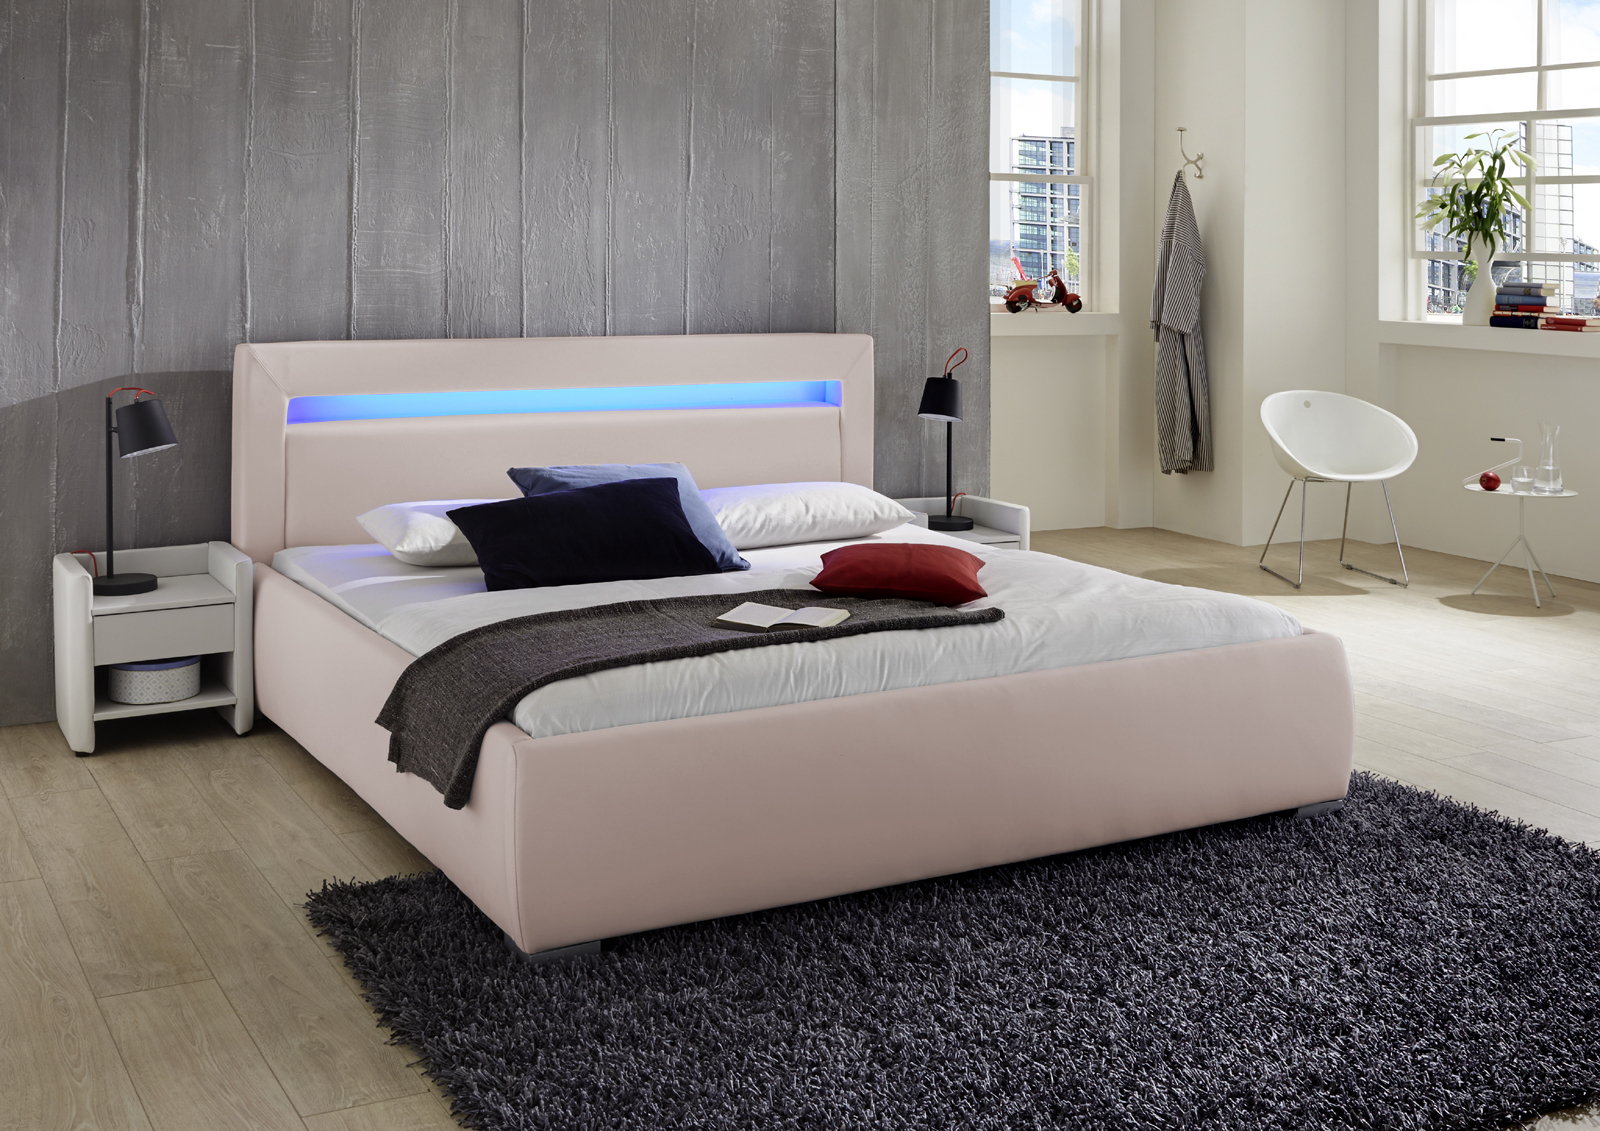 Sam® polsterbett 140 cm lumina led farbauswahl